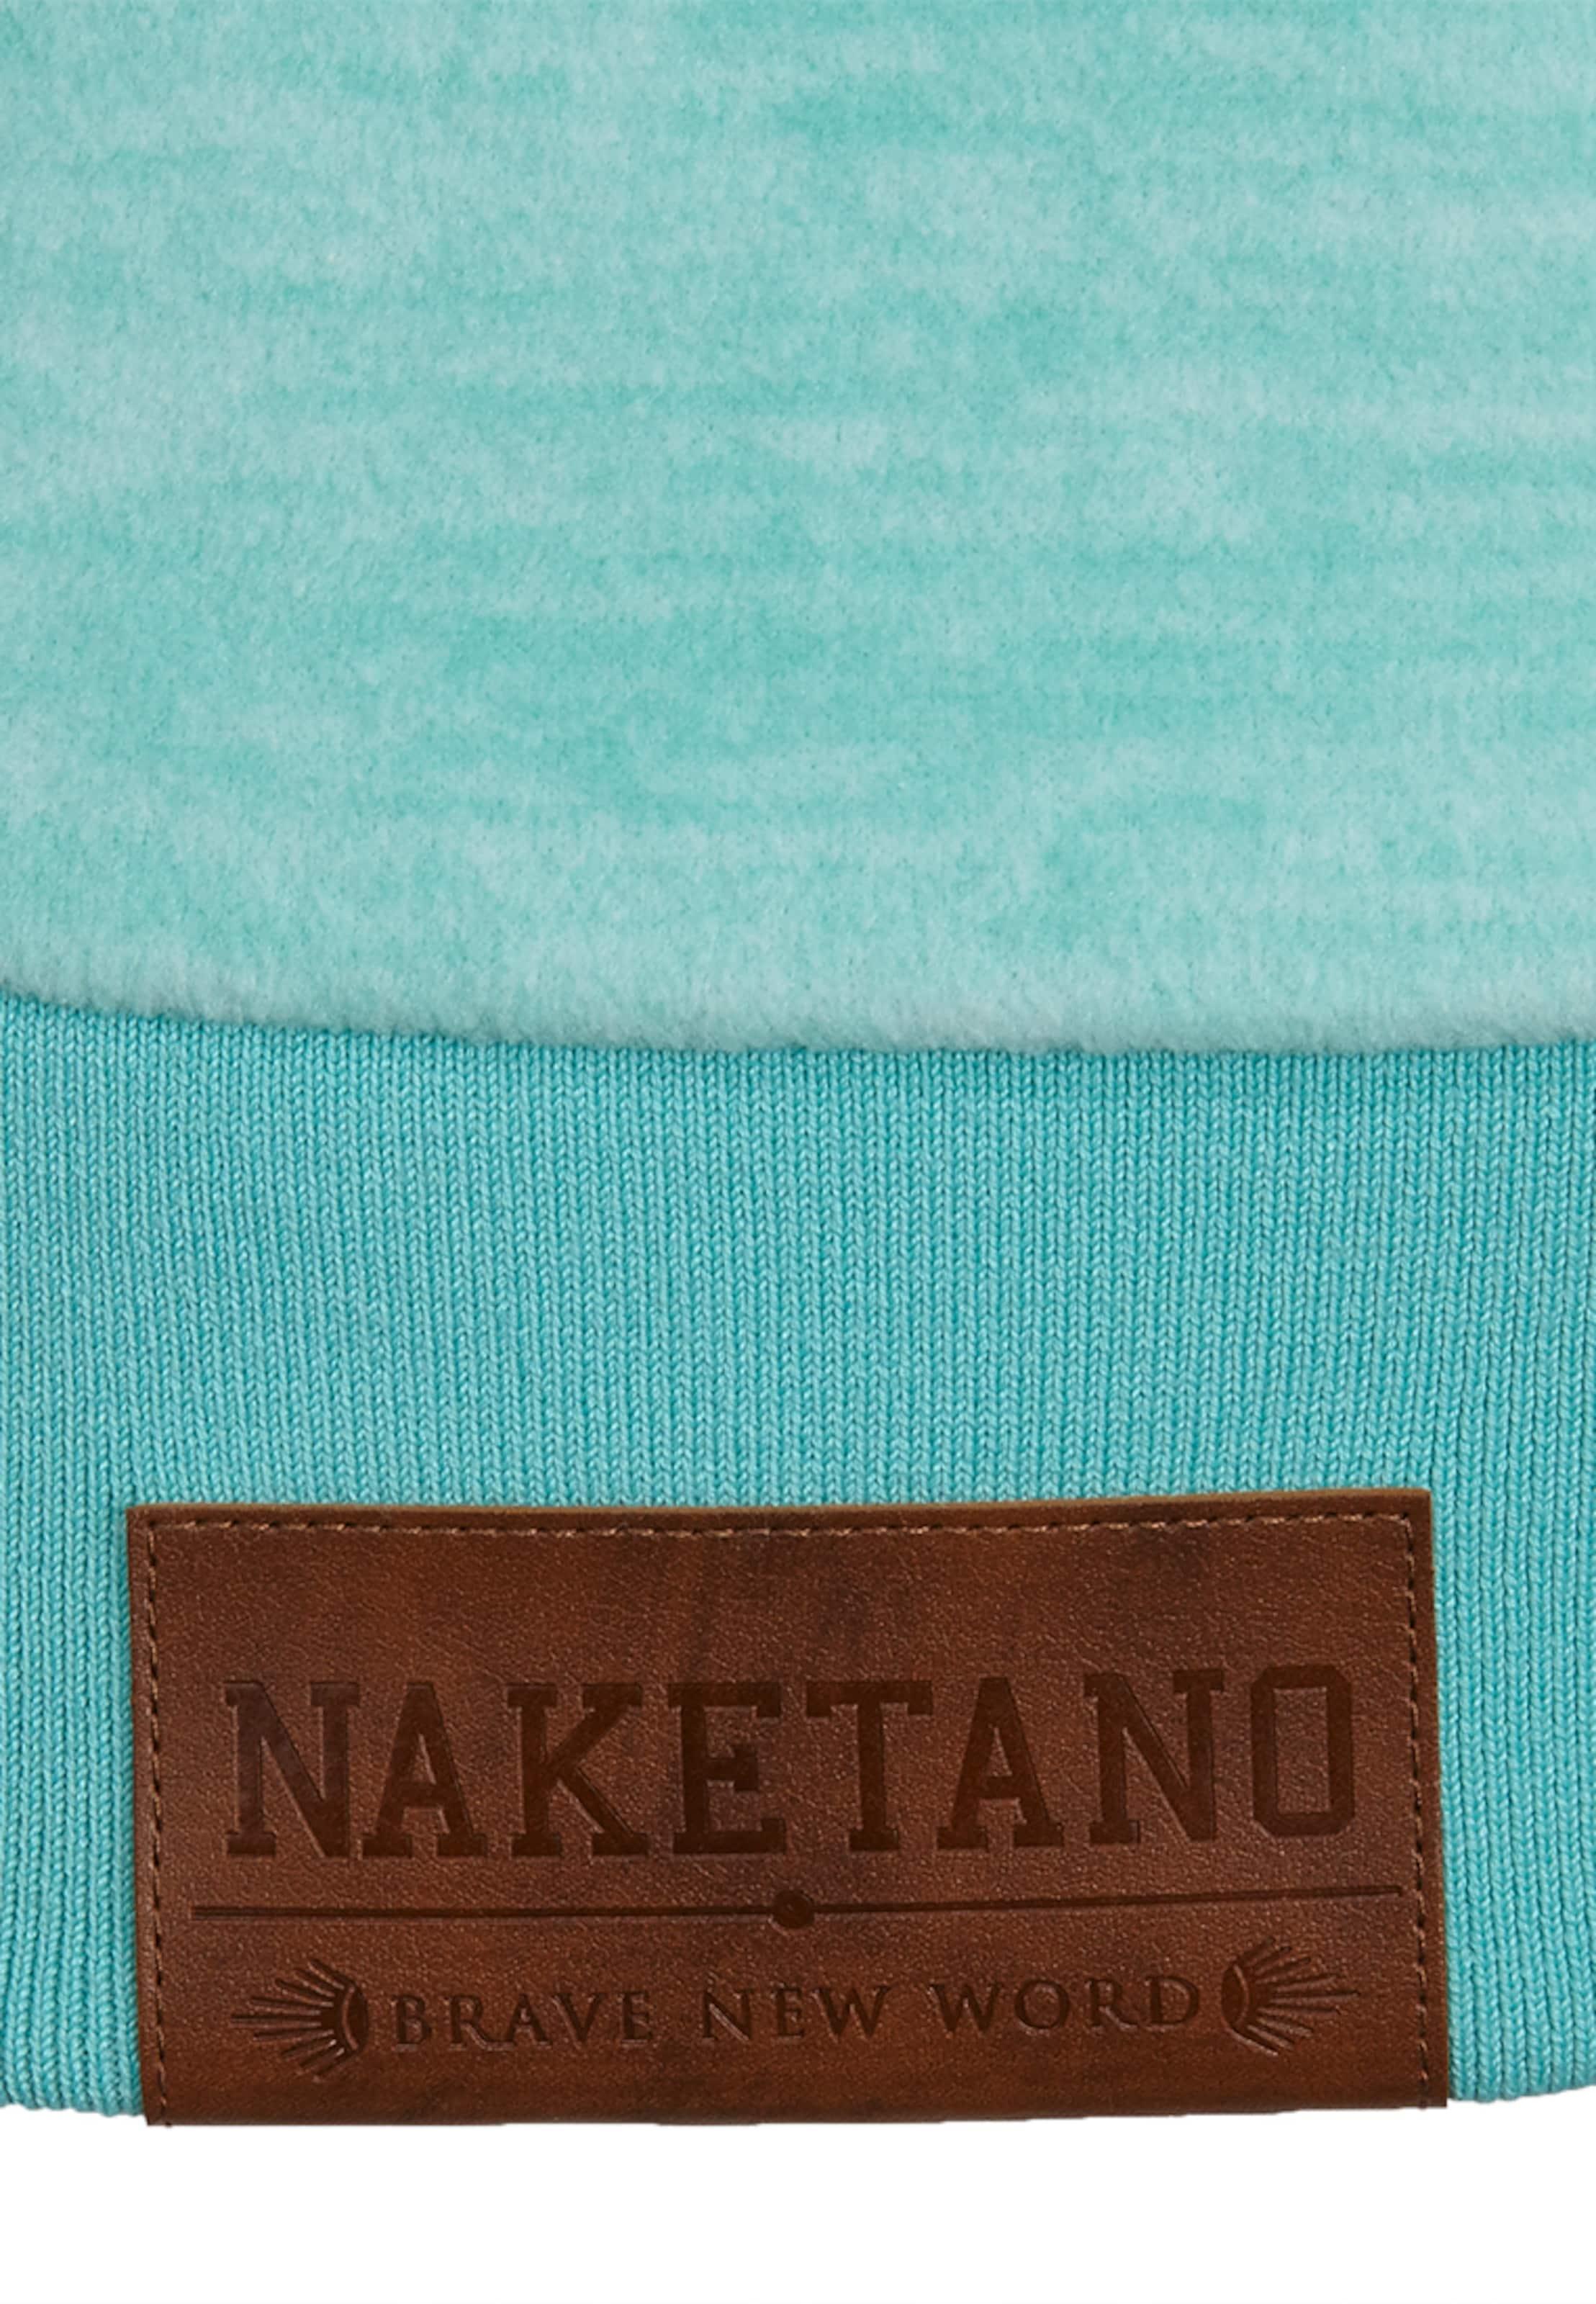 shirt Hier Iii' Vert 'onanier Sweat Naketano Mir En Pastel KJ1c3uTF5l